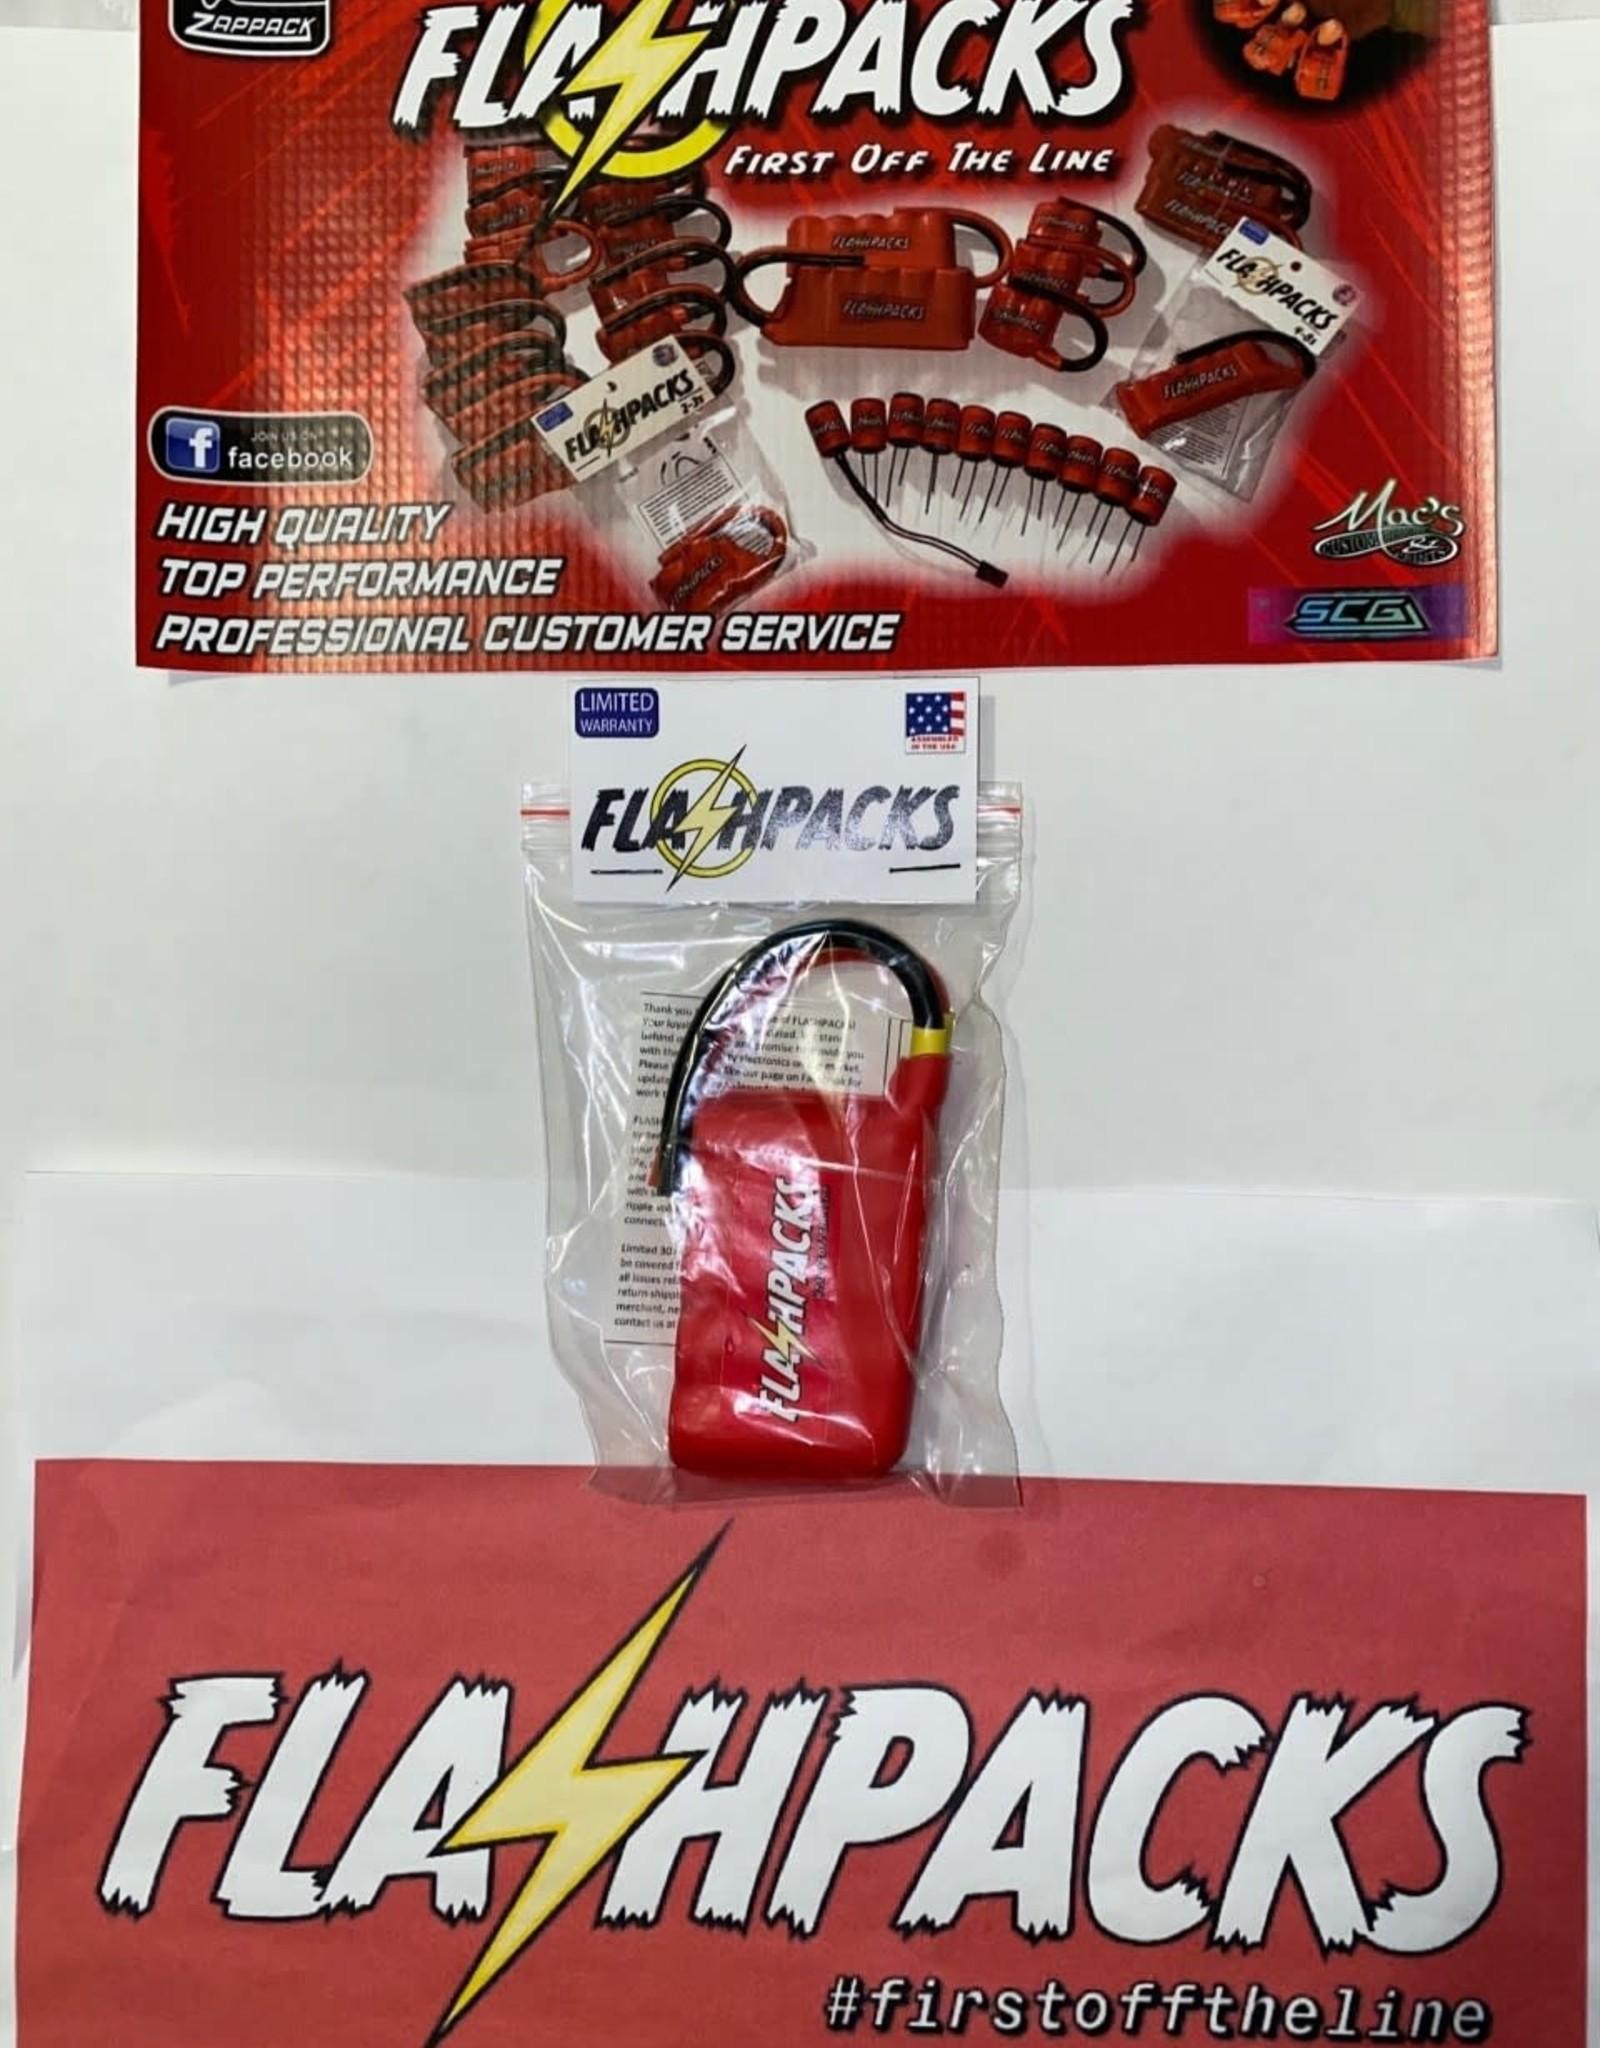 FP4-6S Flashpacks 4-6S Cap Pack Capacitor (Flashpacks)